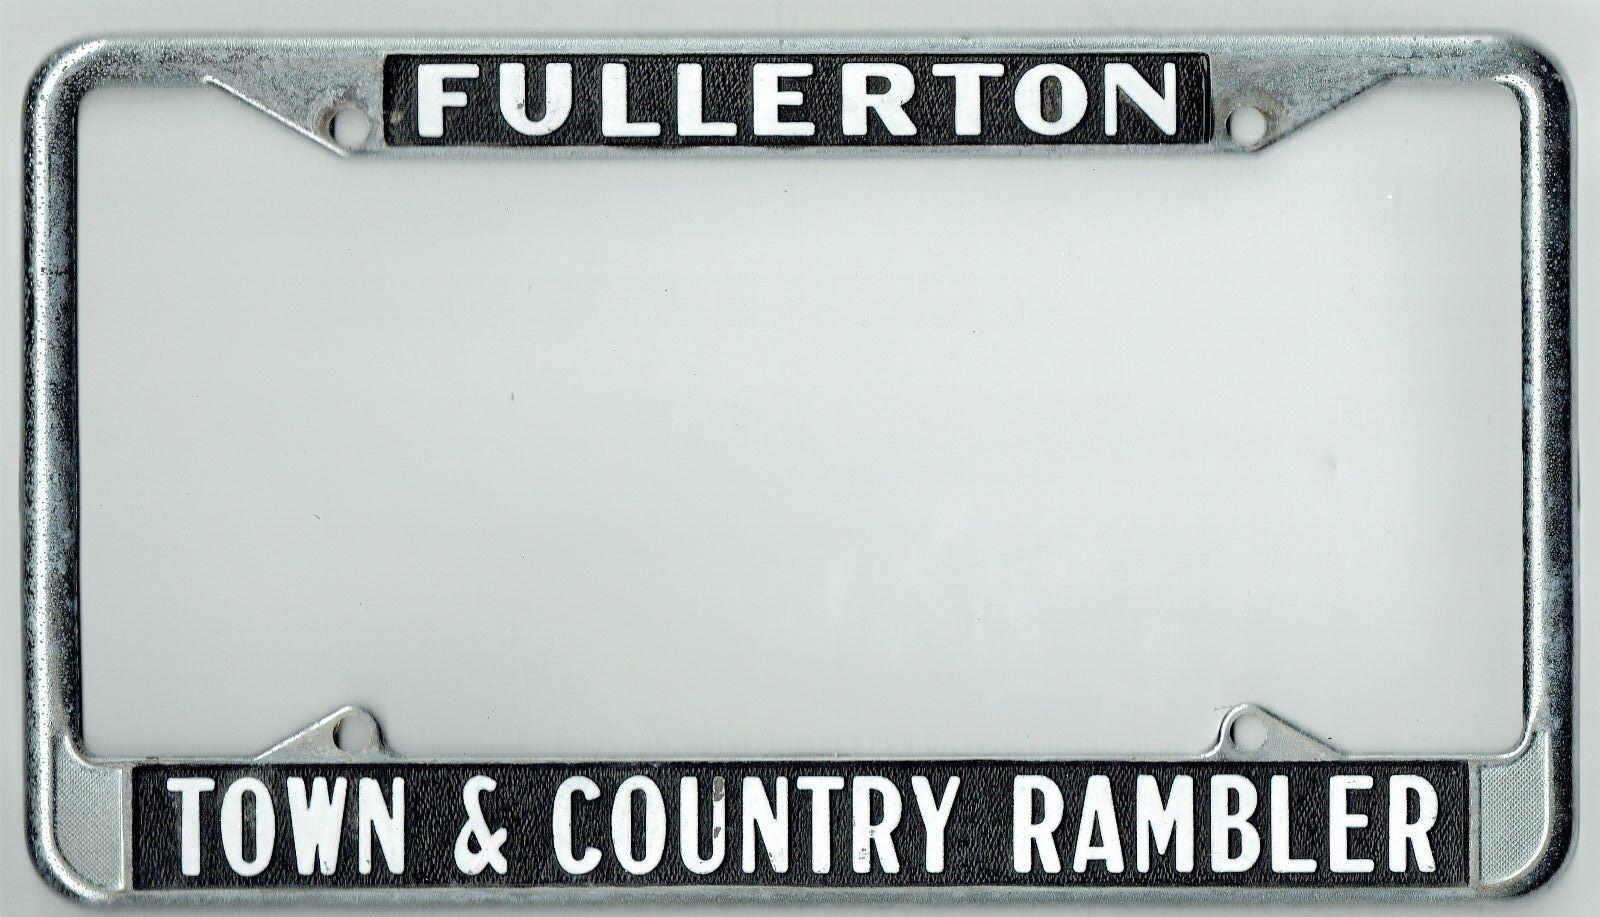 Fullerton California Town & Country Rambler Vintage Dealer License ...